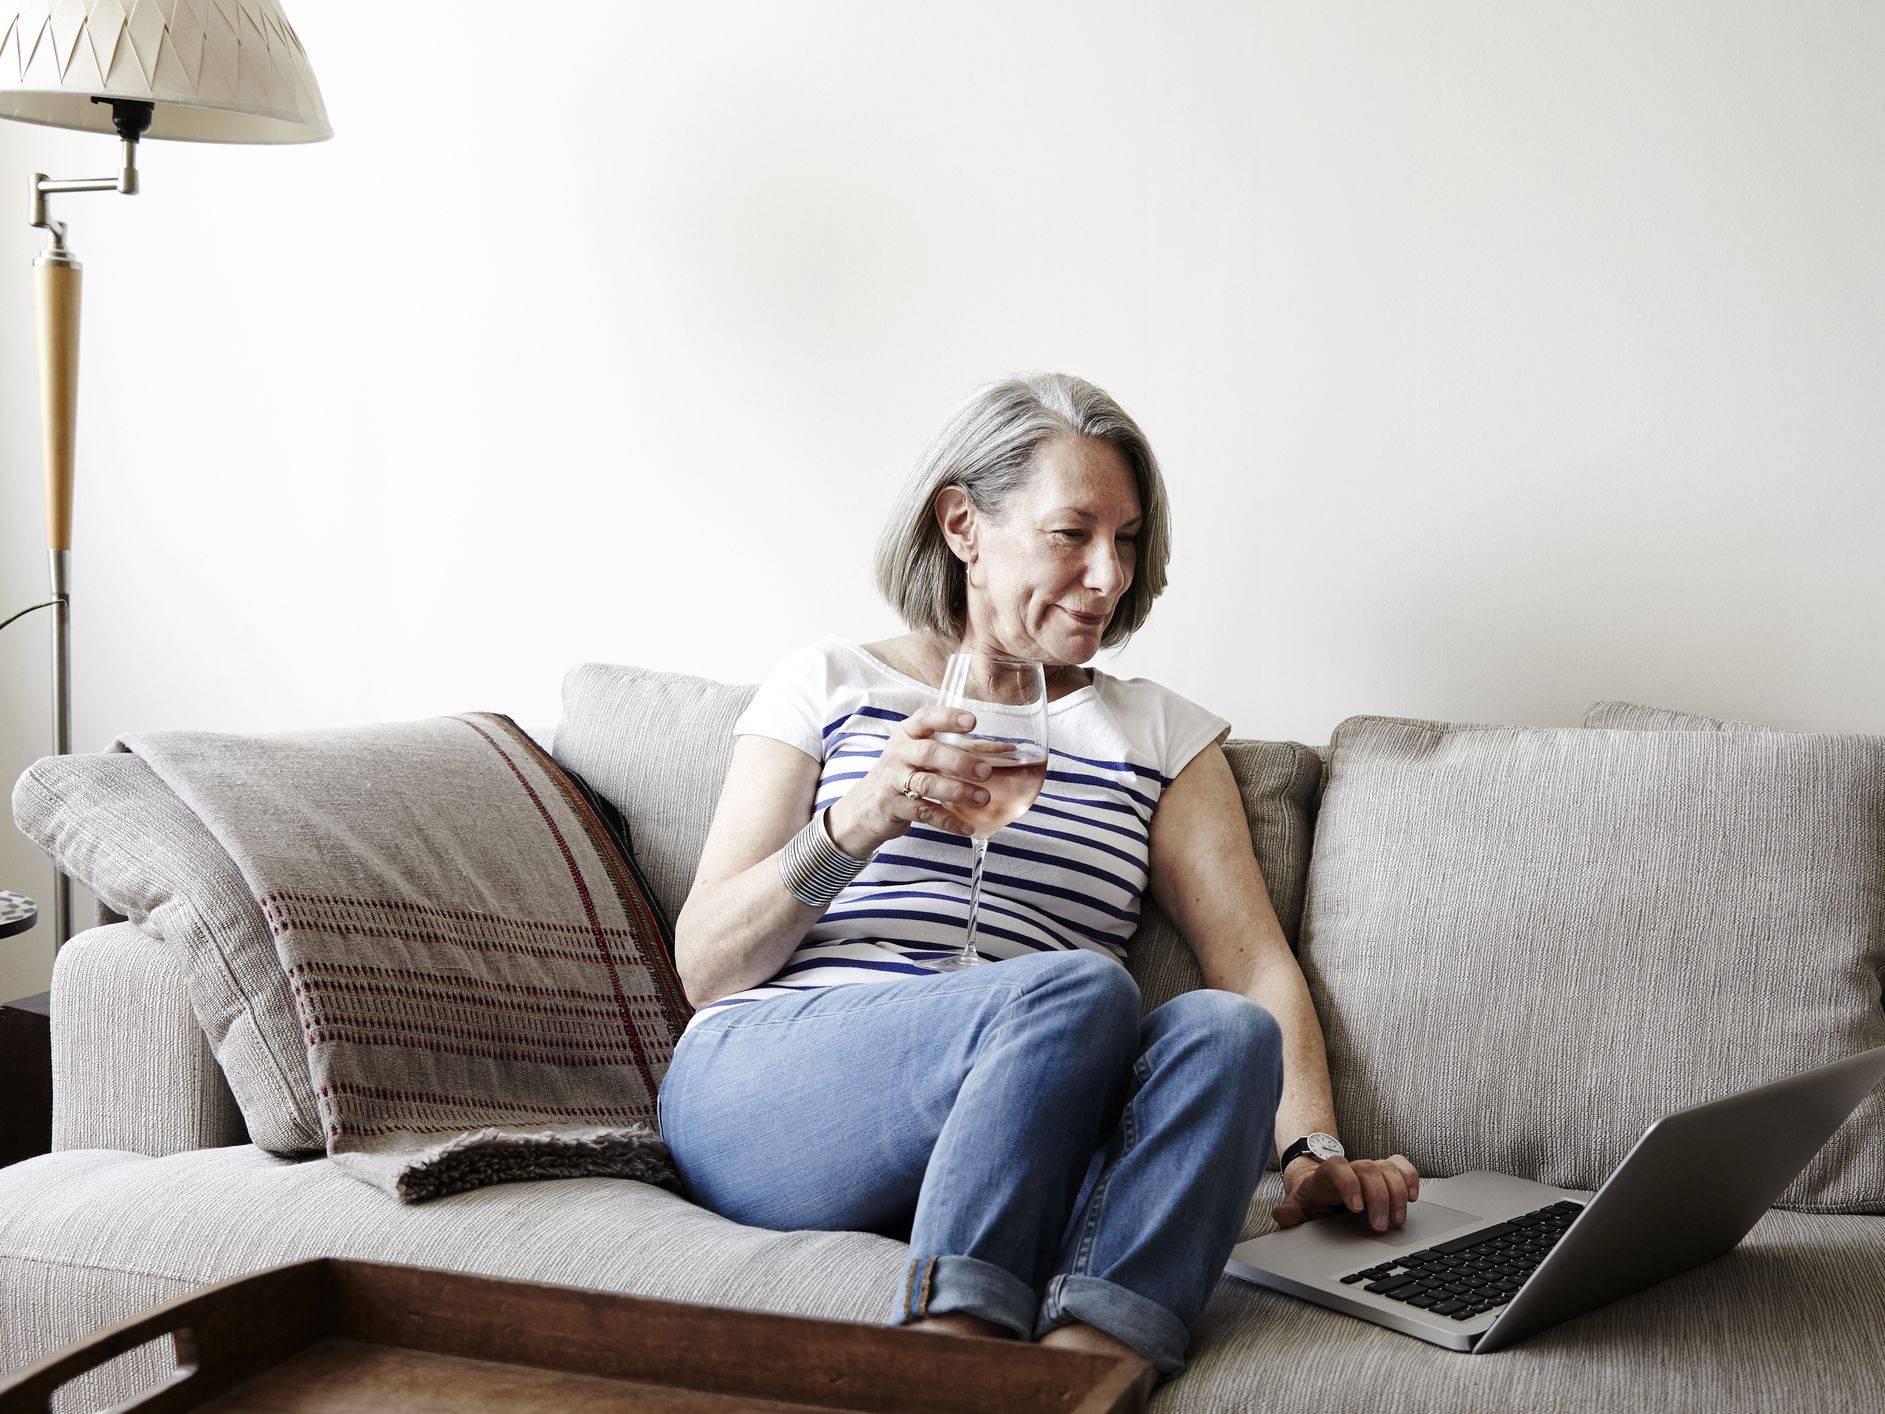 Four Steps to Self-Care